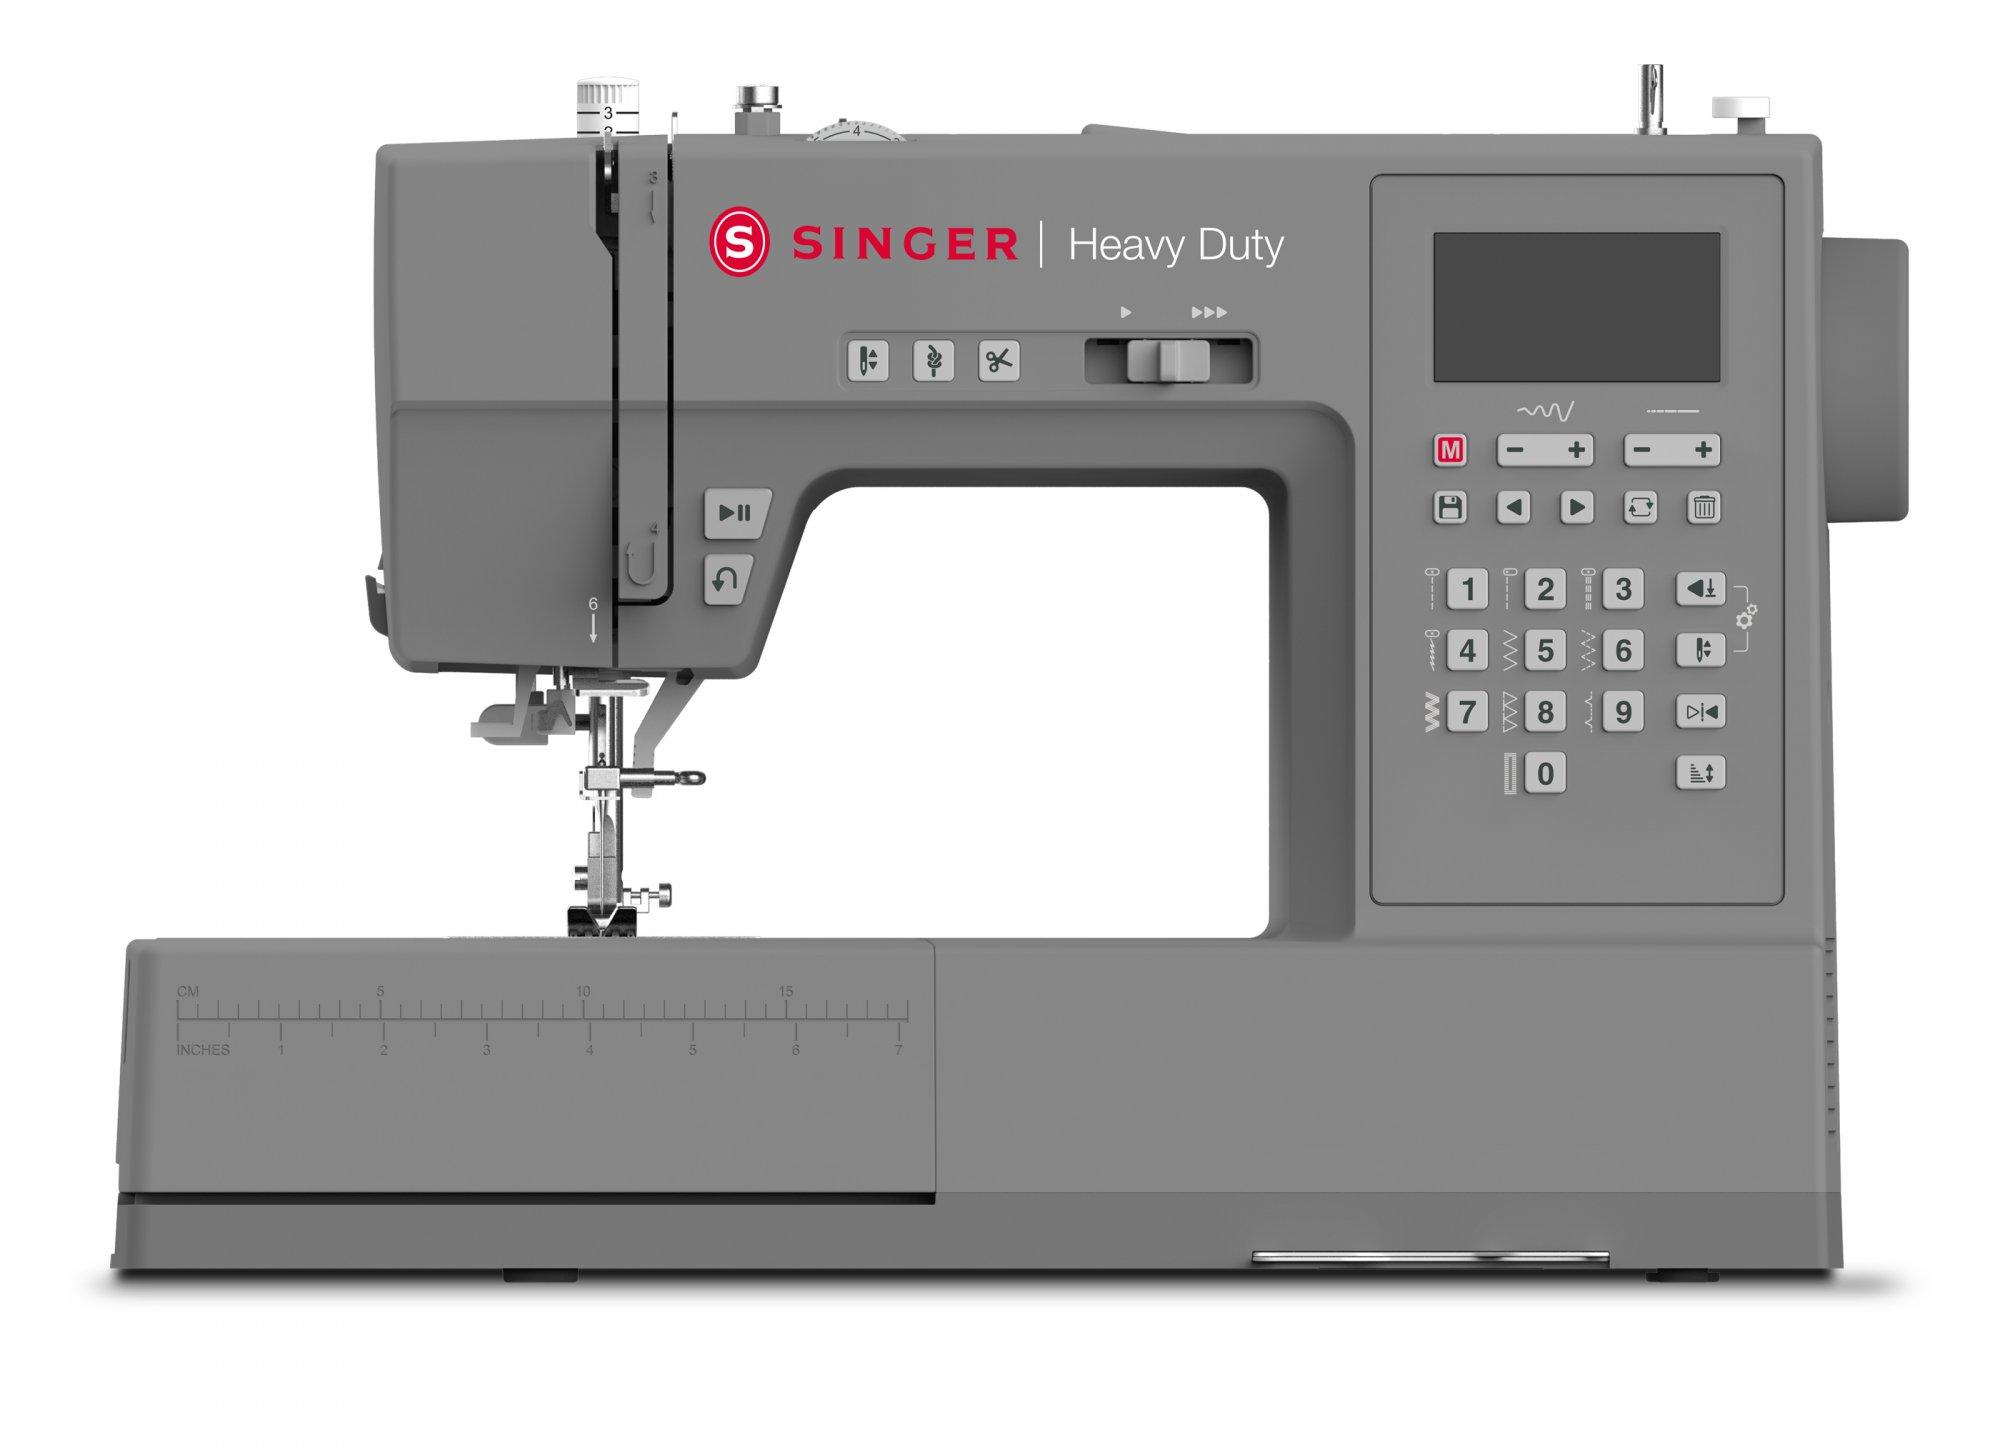 Heavy Duty 6800C Sewing Machine